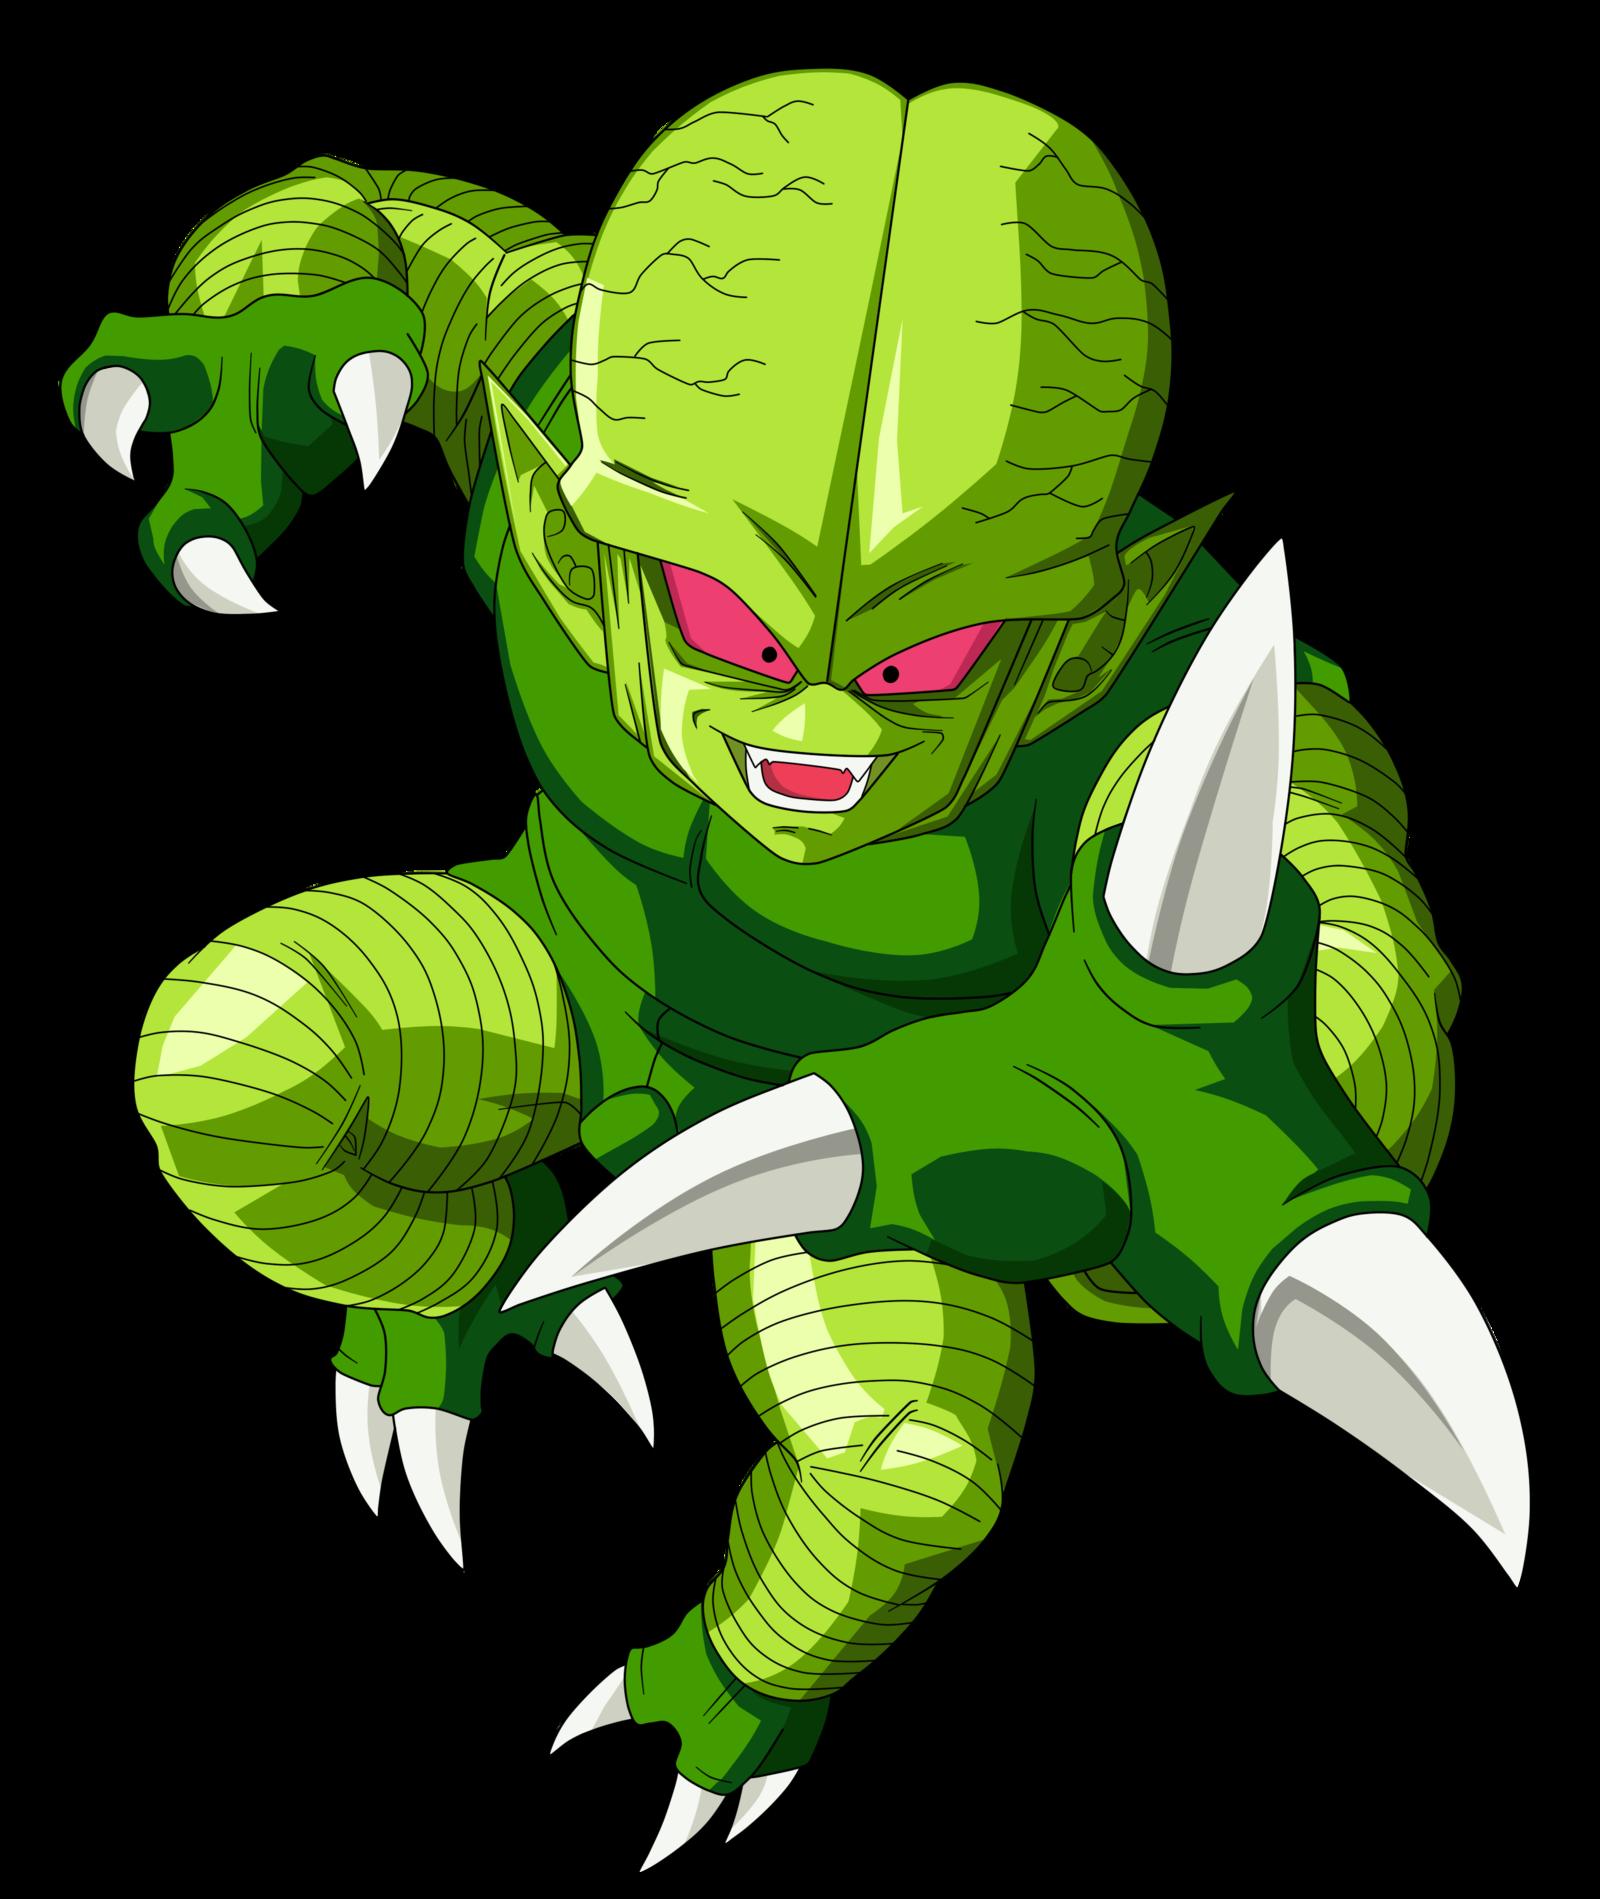 Dragon Ball Z Cartoon Characters Names : Saibamen alien species fandom powered by wikia